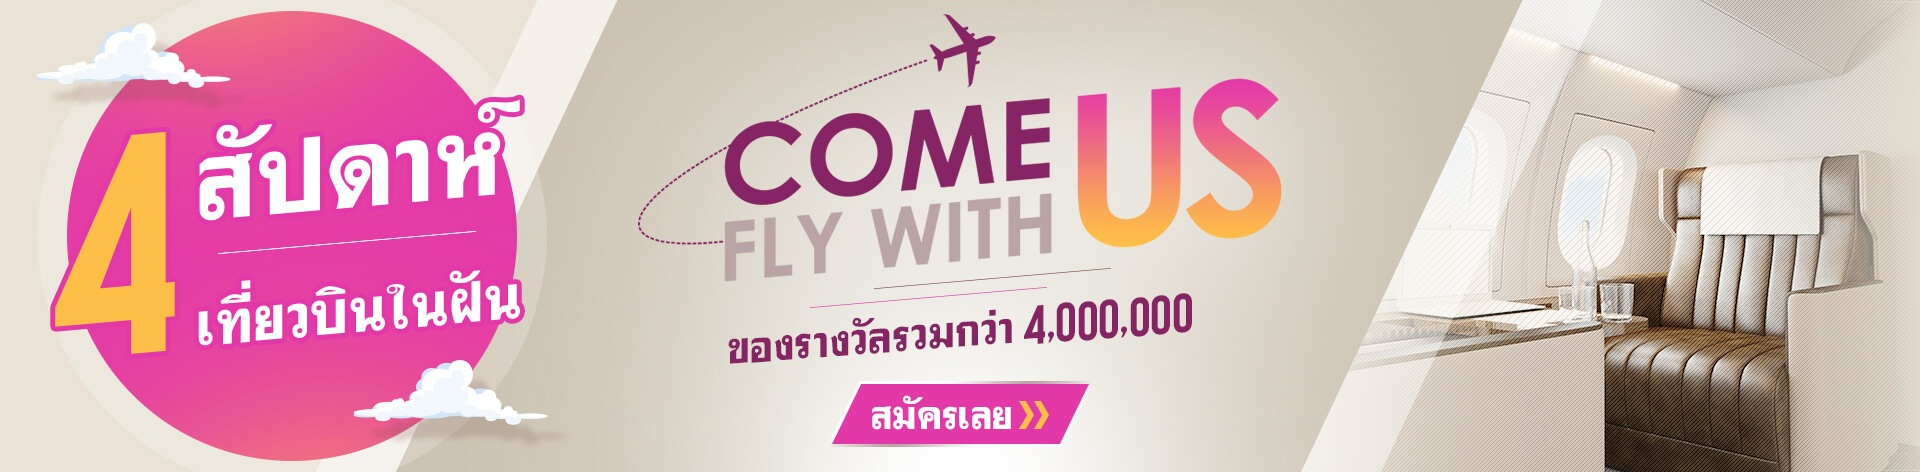 Come Fly with Us 4 สัปดาห์ 4 เที่ยวบินในฝัน | LuckyNiki